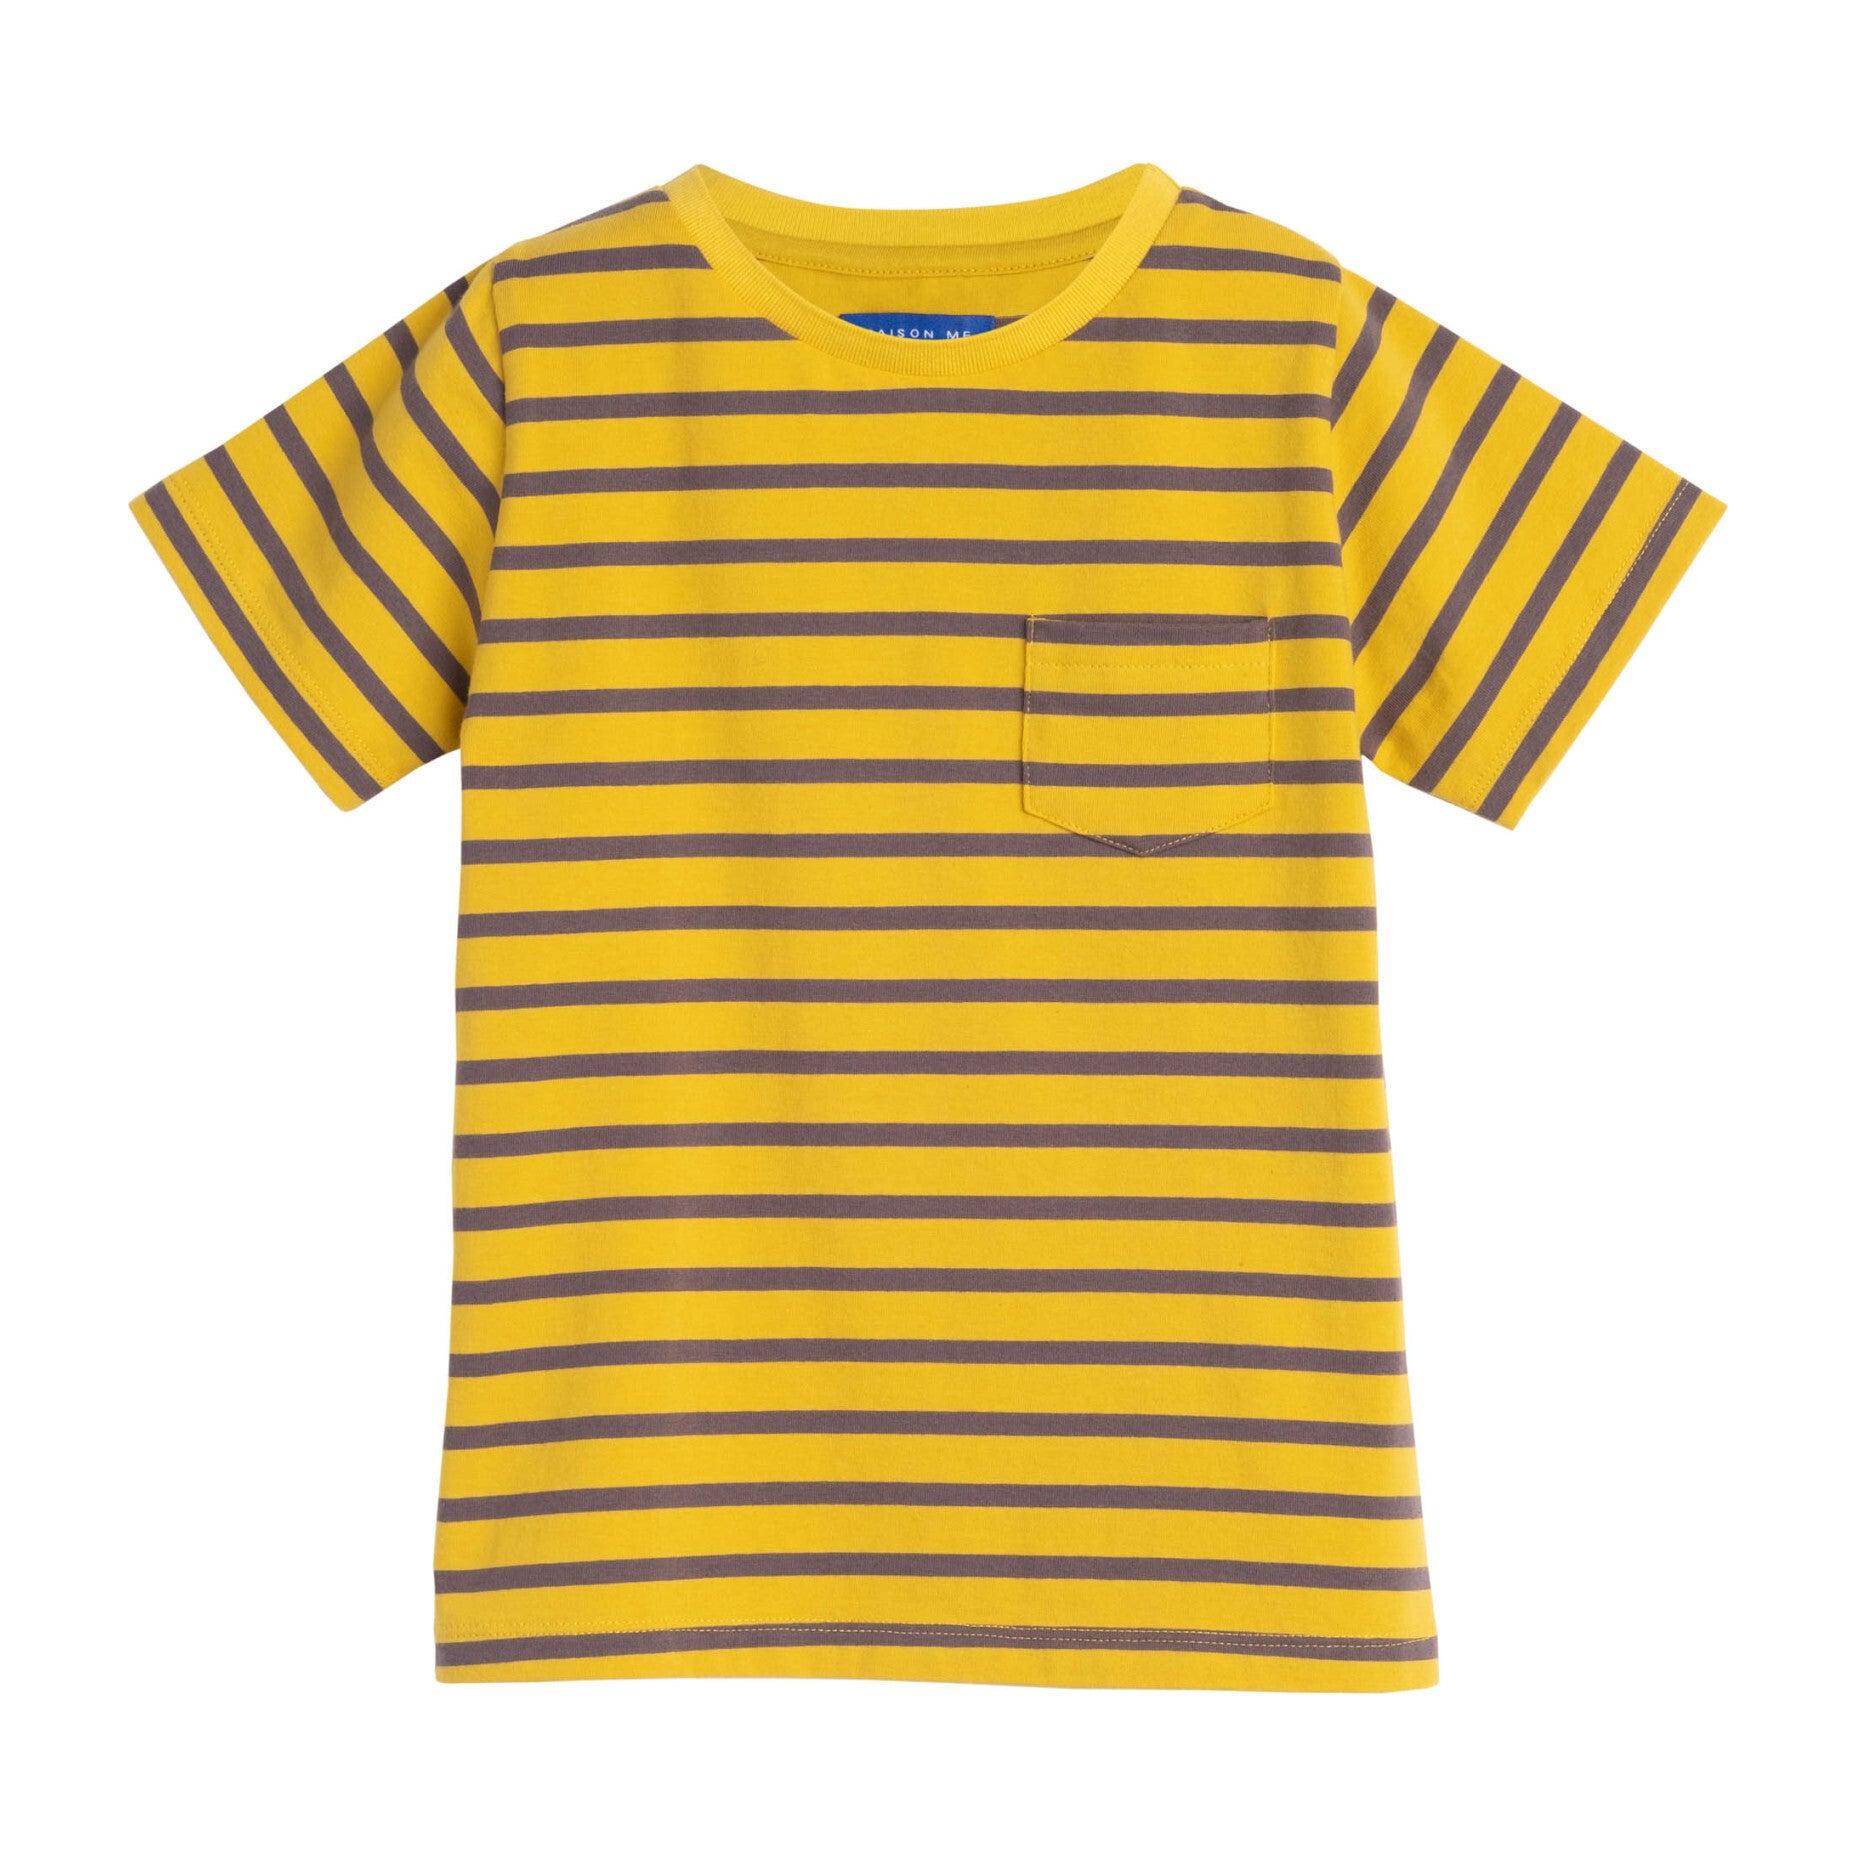 Avery Striped Pocket Tee, Mustard & Grey Stripe